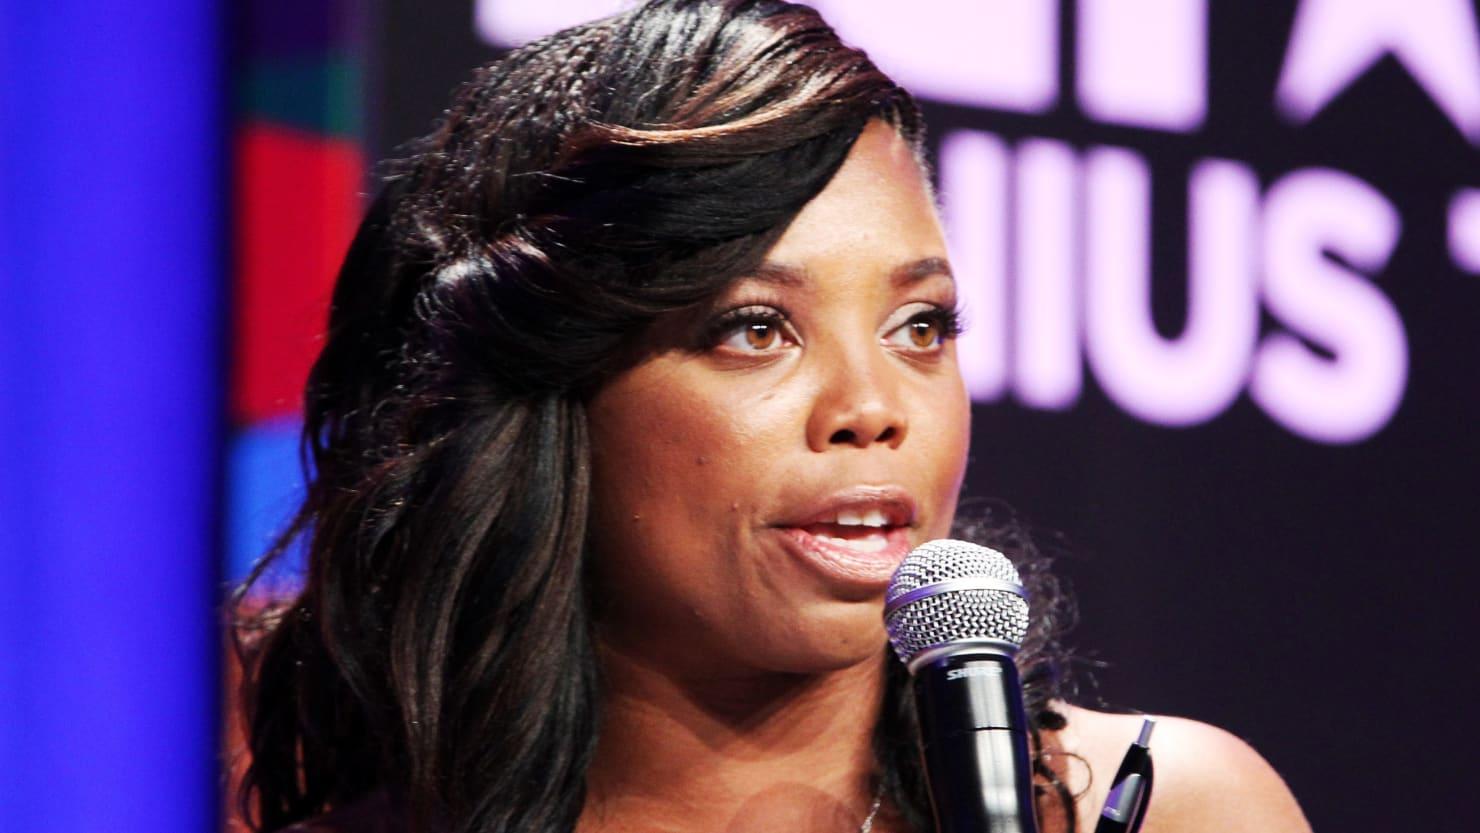 ESPNs Jemele Hill Attempts to Make Laura Ingraham Boycott Racial